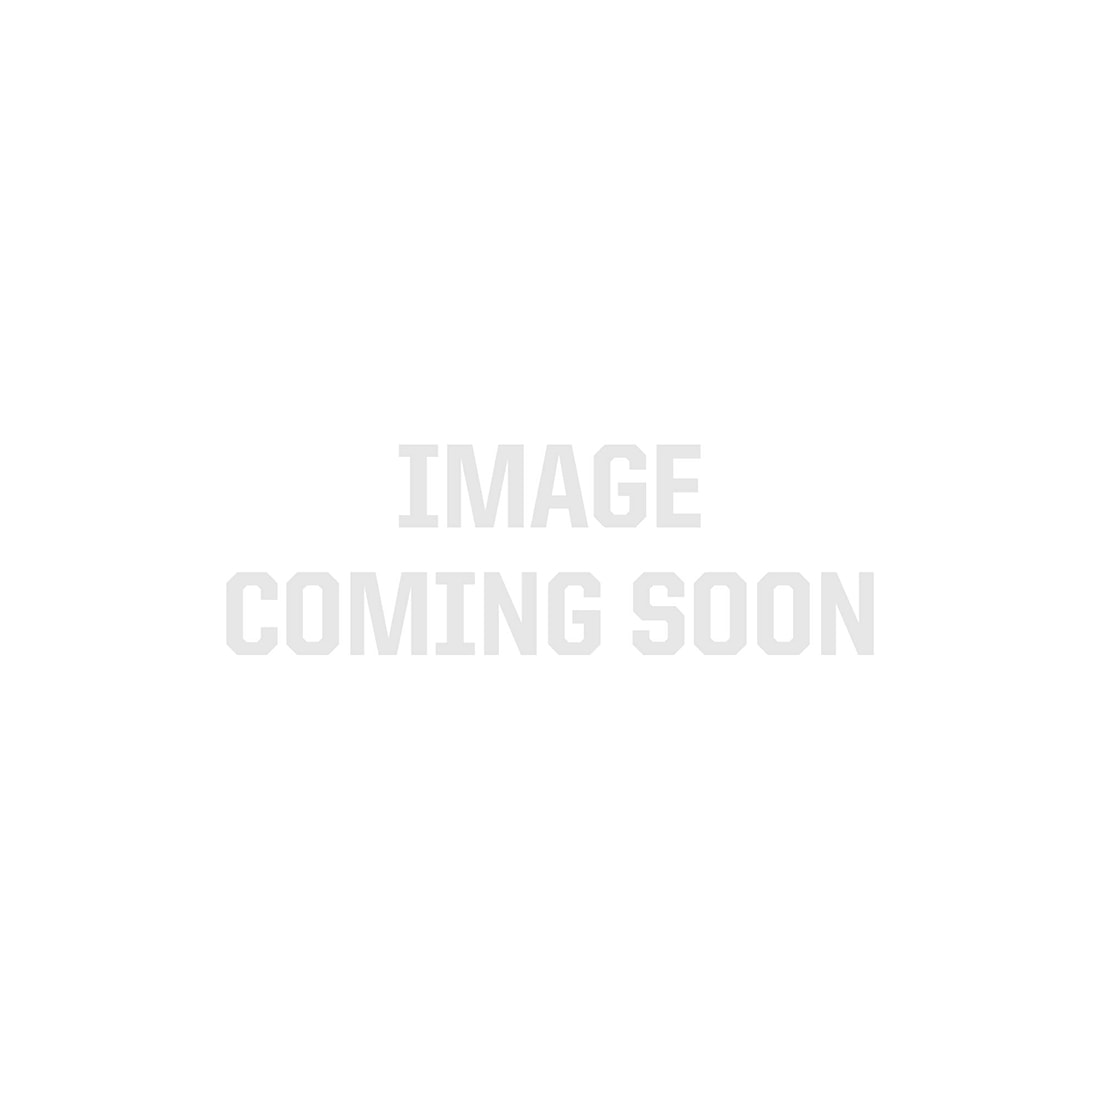 BlackBox F-1 G4 MK2, Transmitter/Receiver. 2.45GHz & 5.8GHz, DMX/RDM, 512CH